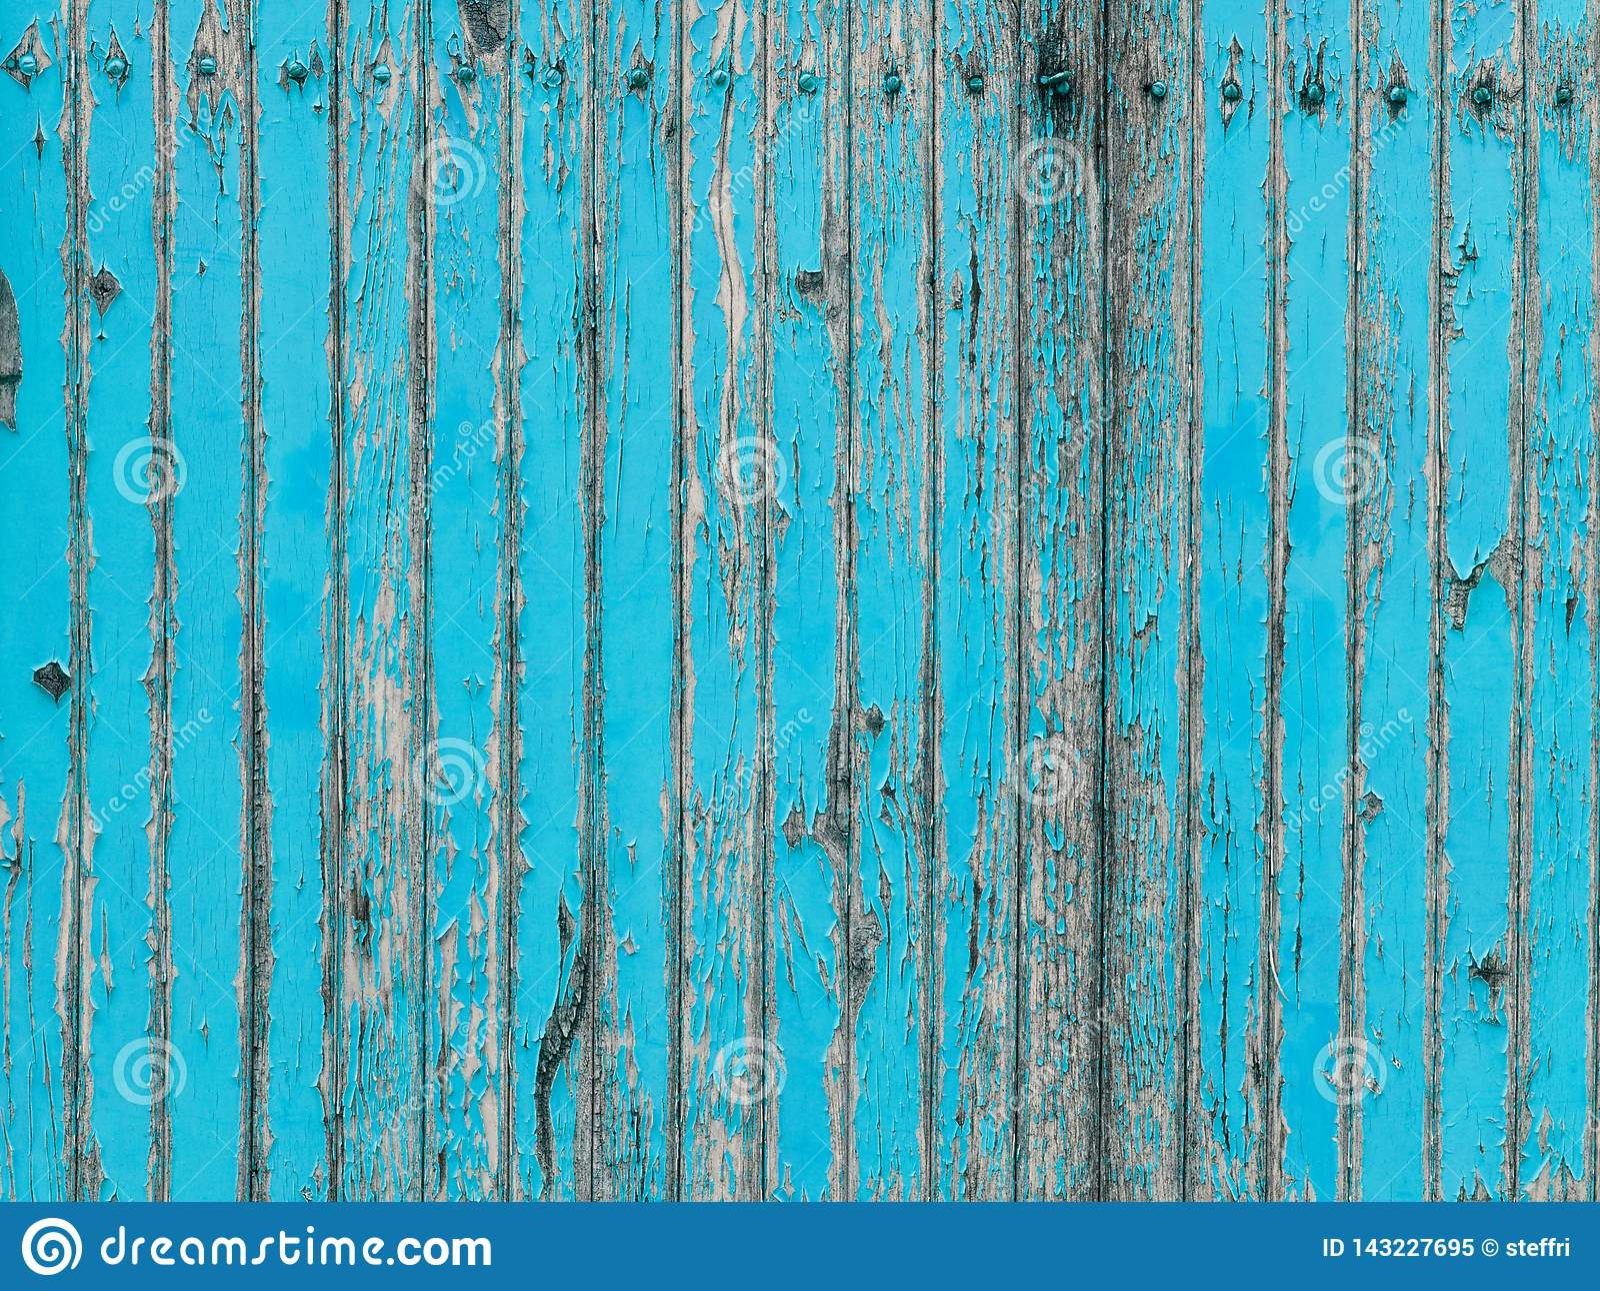 Parede de madeira da prancha de turquesa com descascamento da pintura